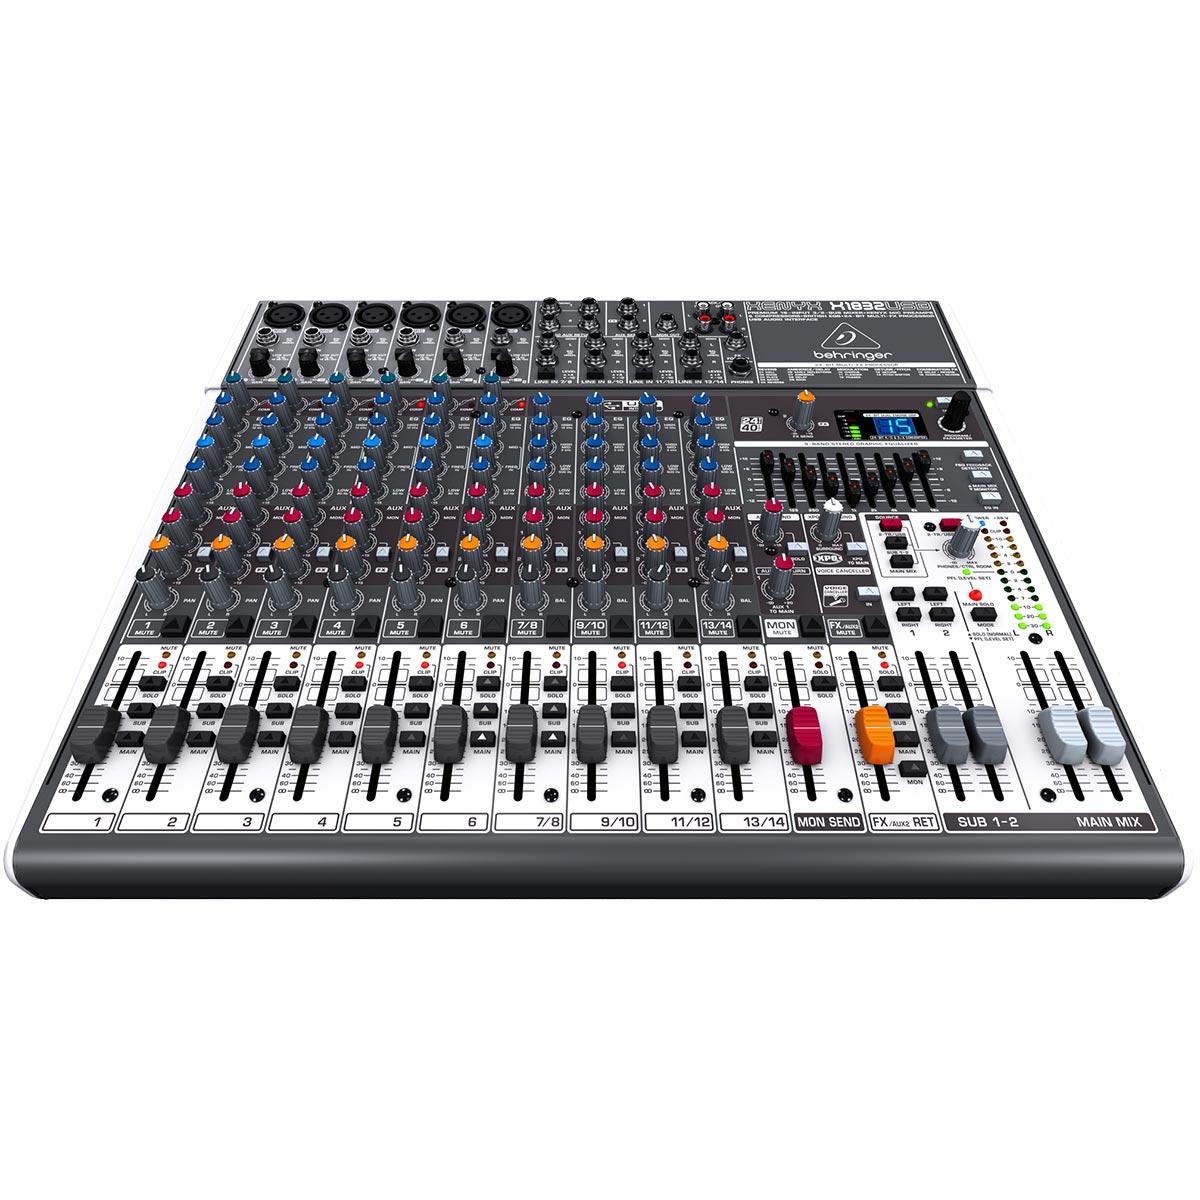 Mesa de Som 18 Canais Balanceado (6 XLR + 12 P10) c/ USB / Efeito / Phantom / 3 Auxiliares - Xenyx X 1832 USB Behringer